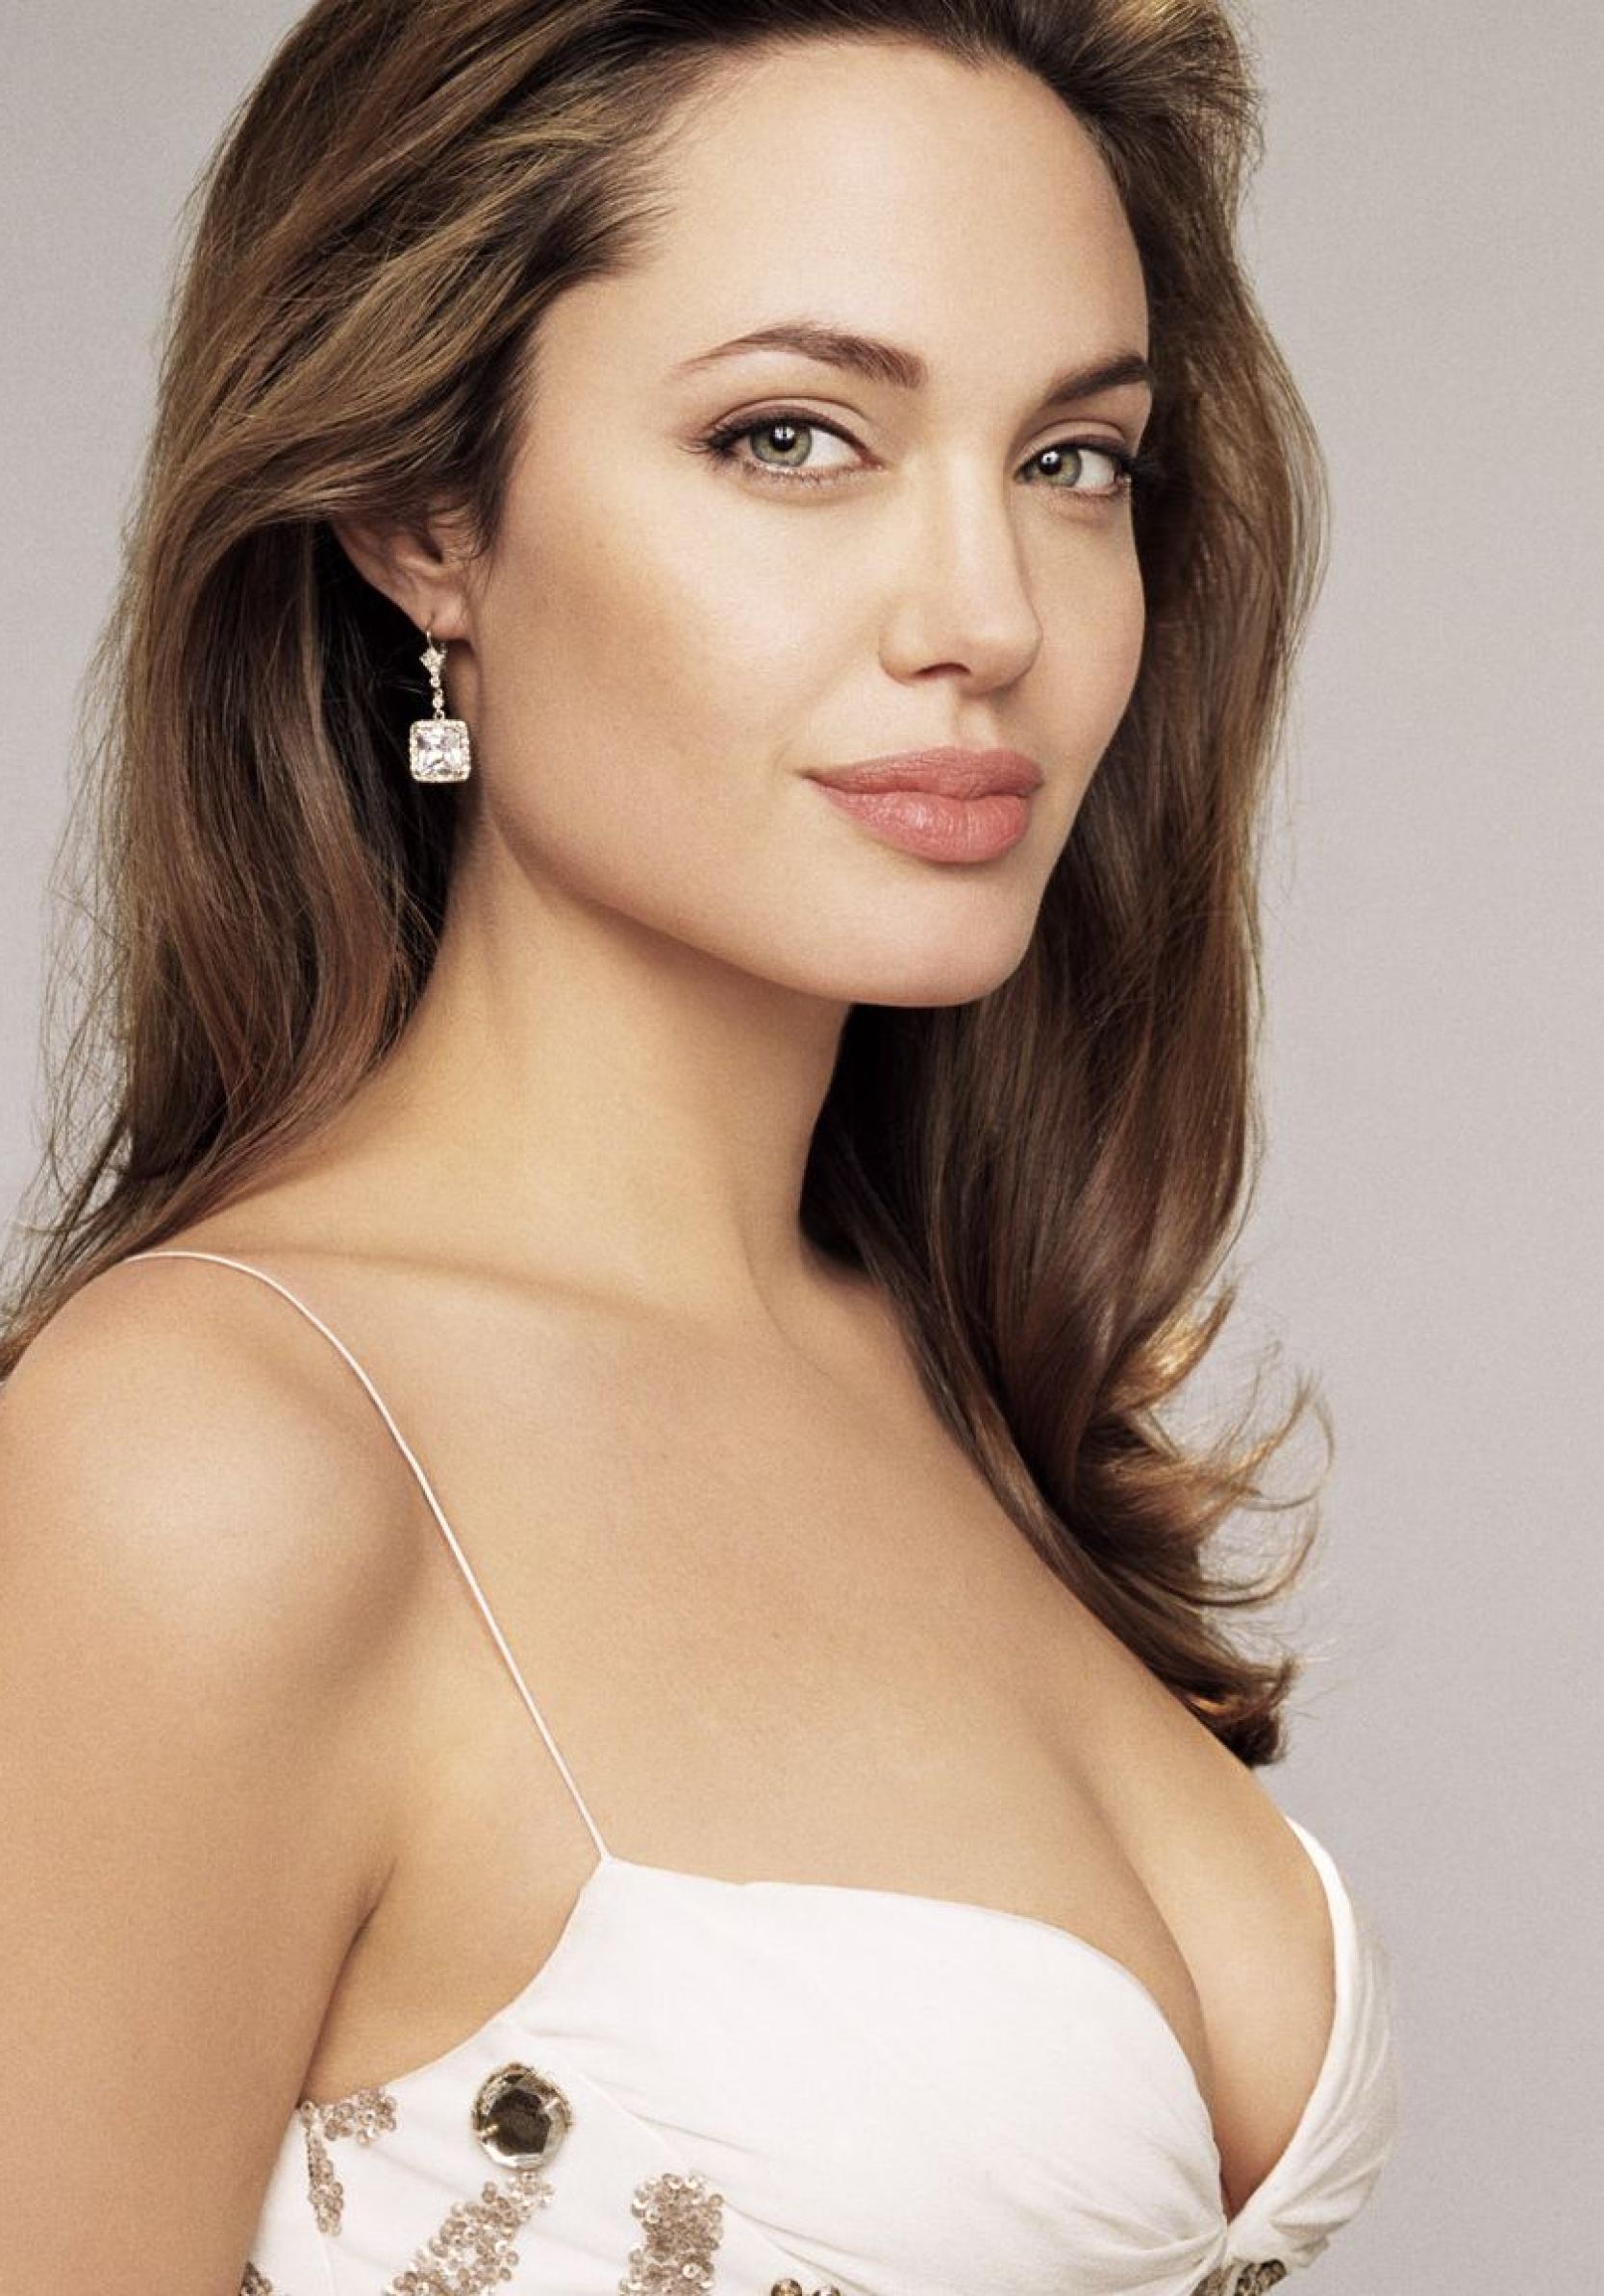 Angelina Jolie Nude Pictures 1668x2388 angelina jolie hot hd wallpapers 1668x2388